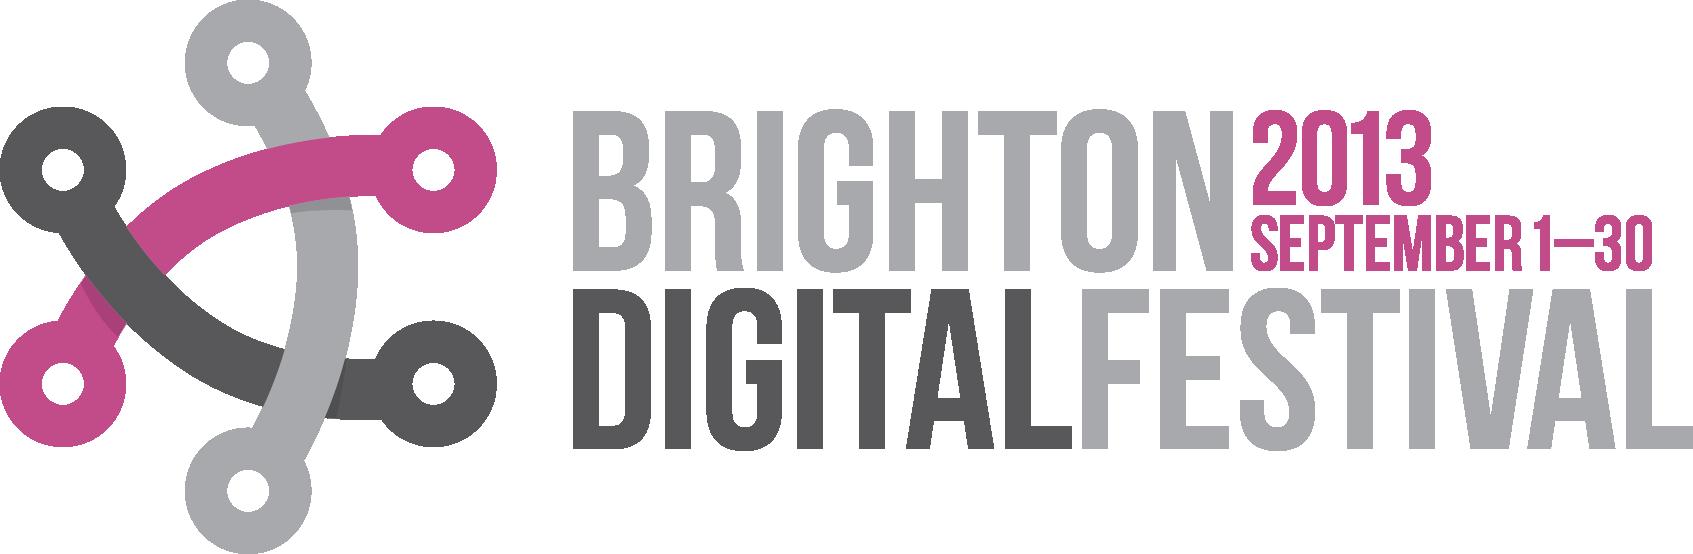 Brighton Digital Festival - Sept 2012